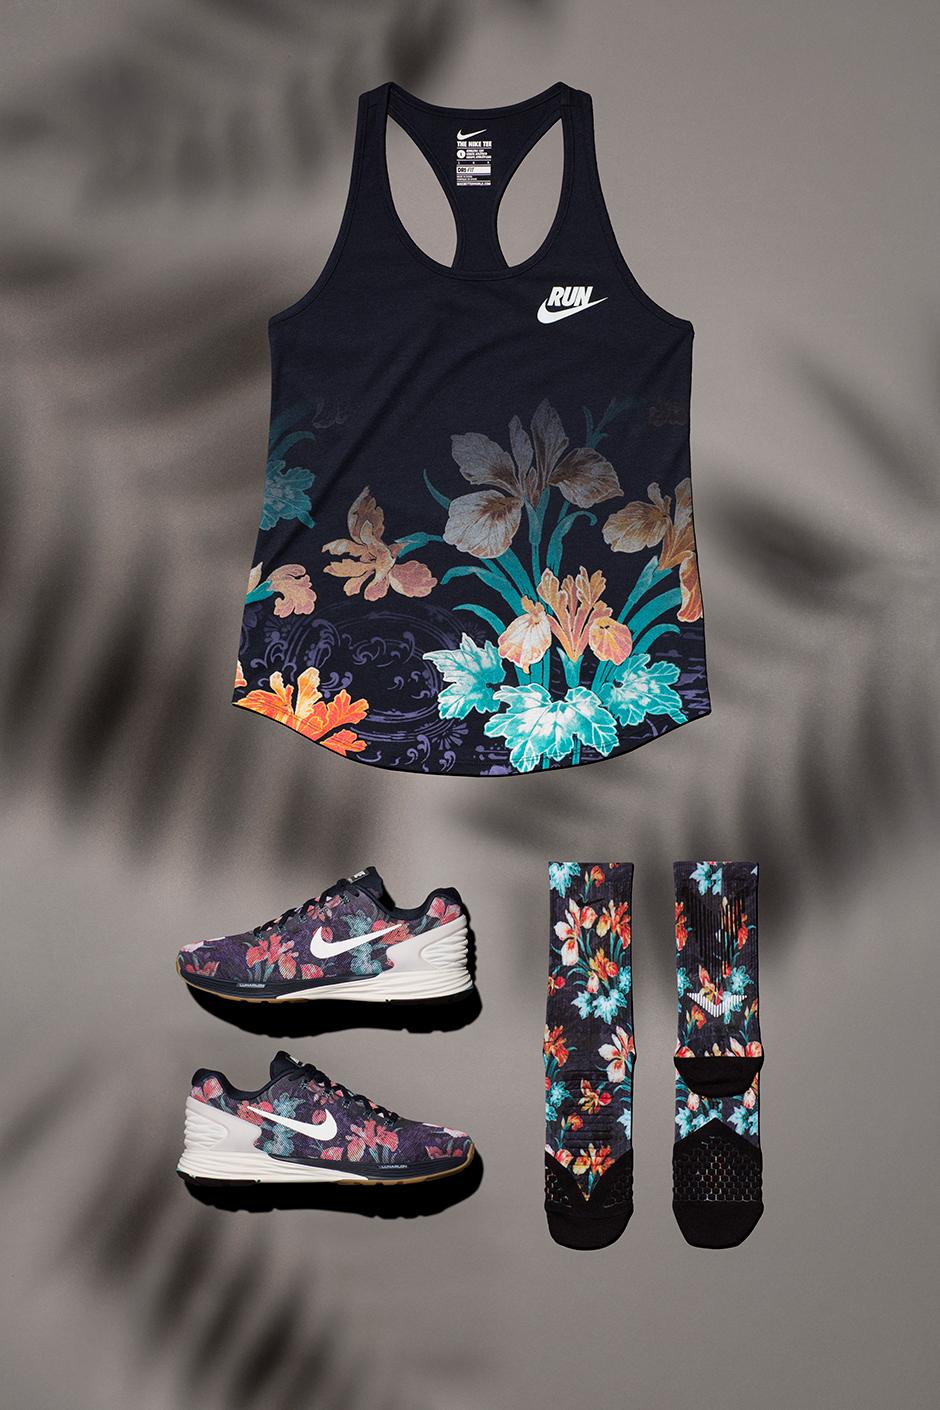 Nike Lunarglide 6 Floral Kvinners Sko dqfLcrEE